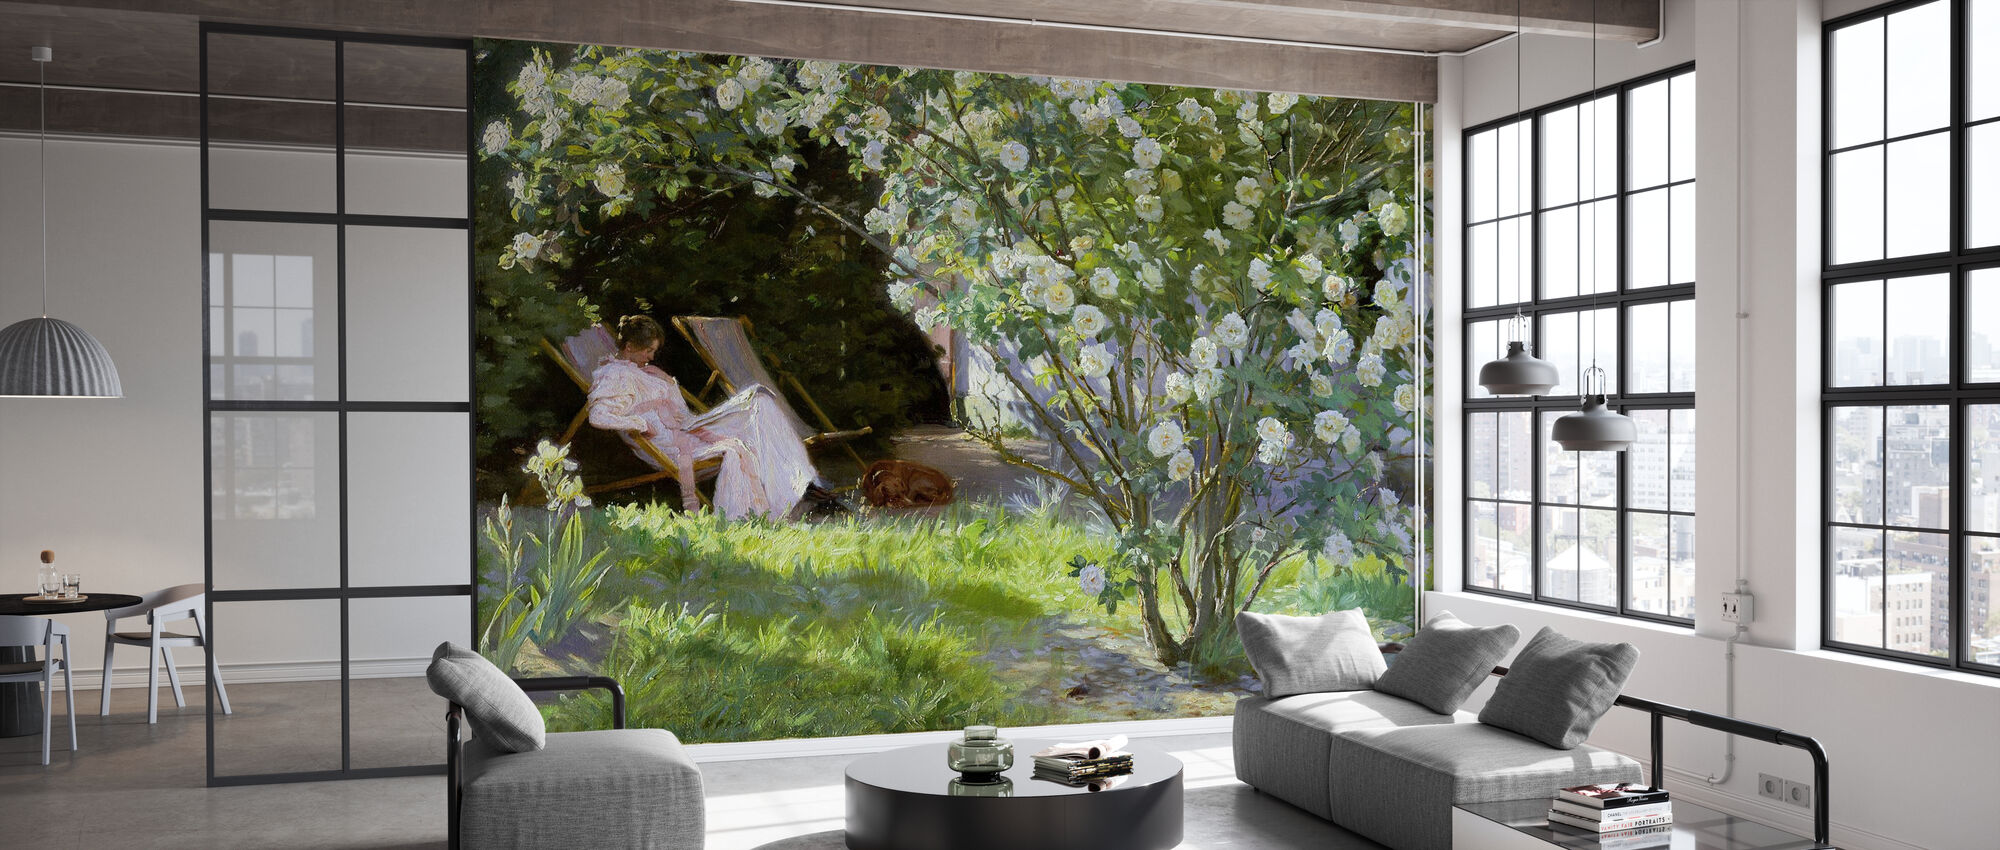 The Artist's Wife in the Garden at Skagen - Peder Severin Kroyer - Wallpaper - Office